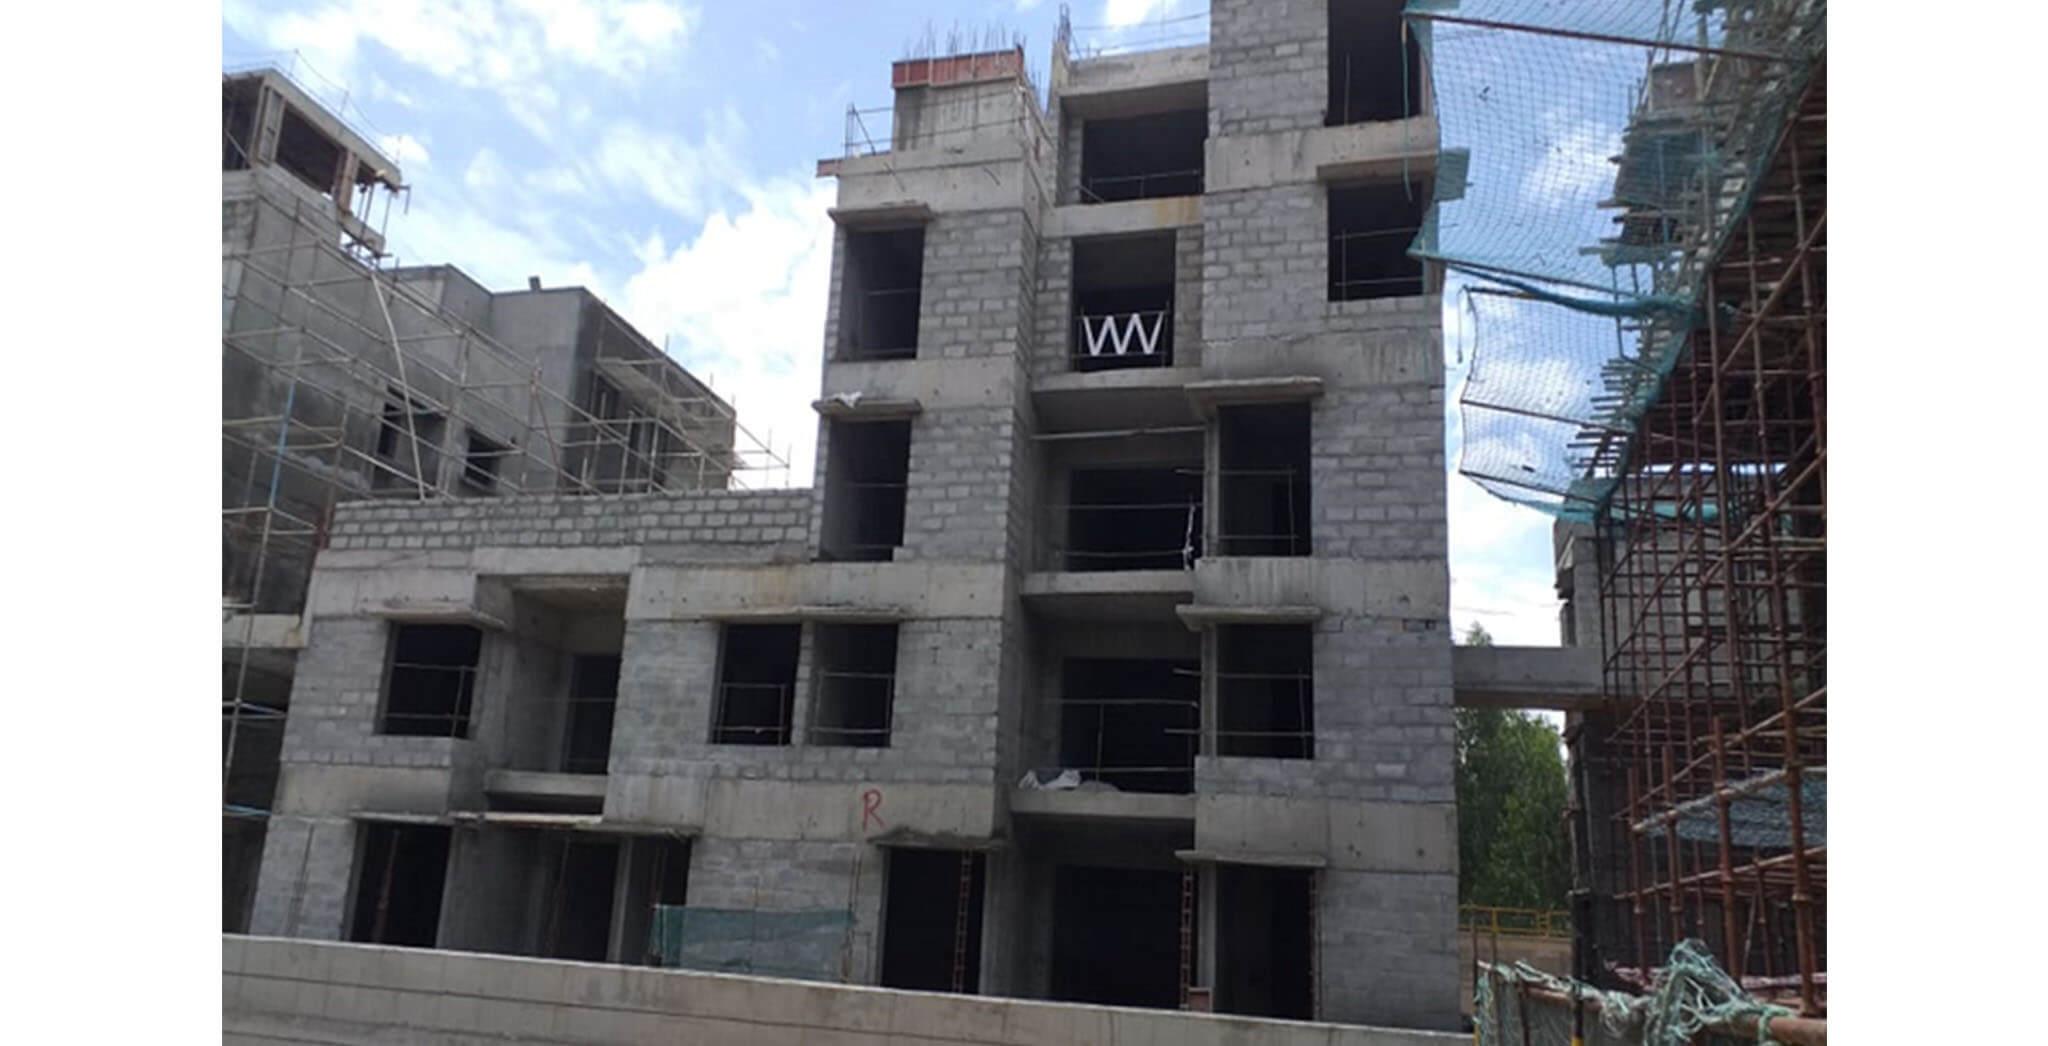 Jun 2021 - Podium side: Block R—Internal plastering work-in-progress at 4th floor level